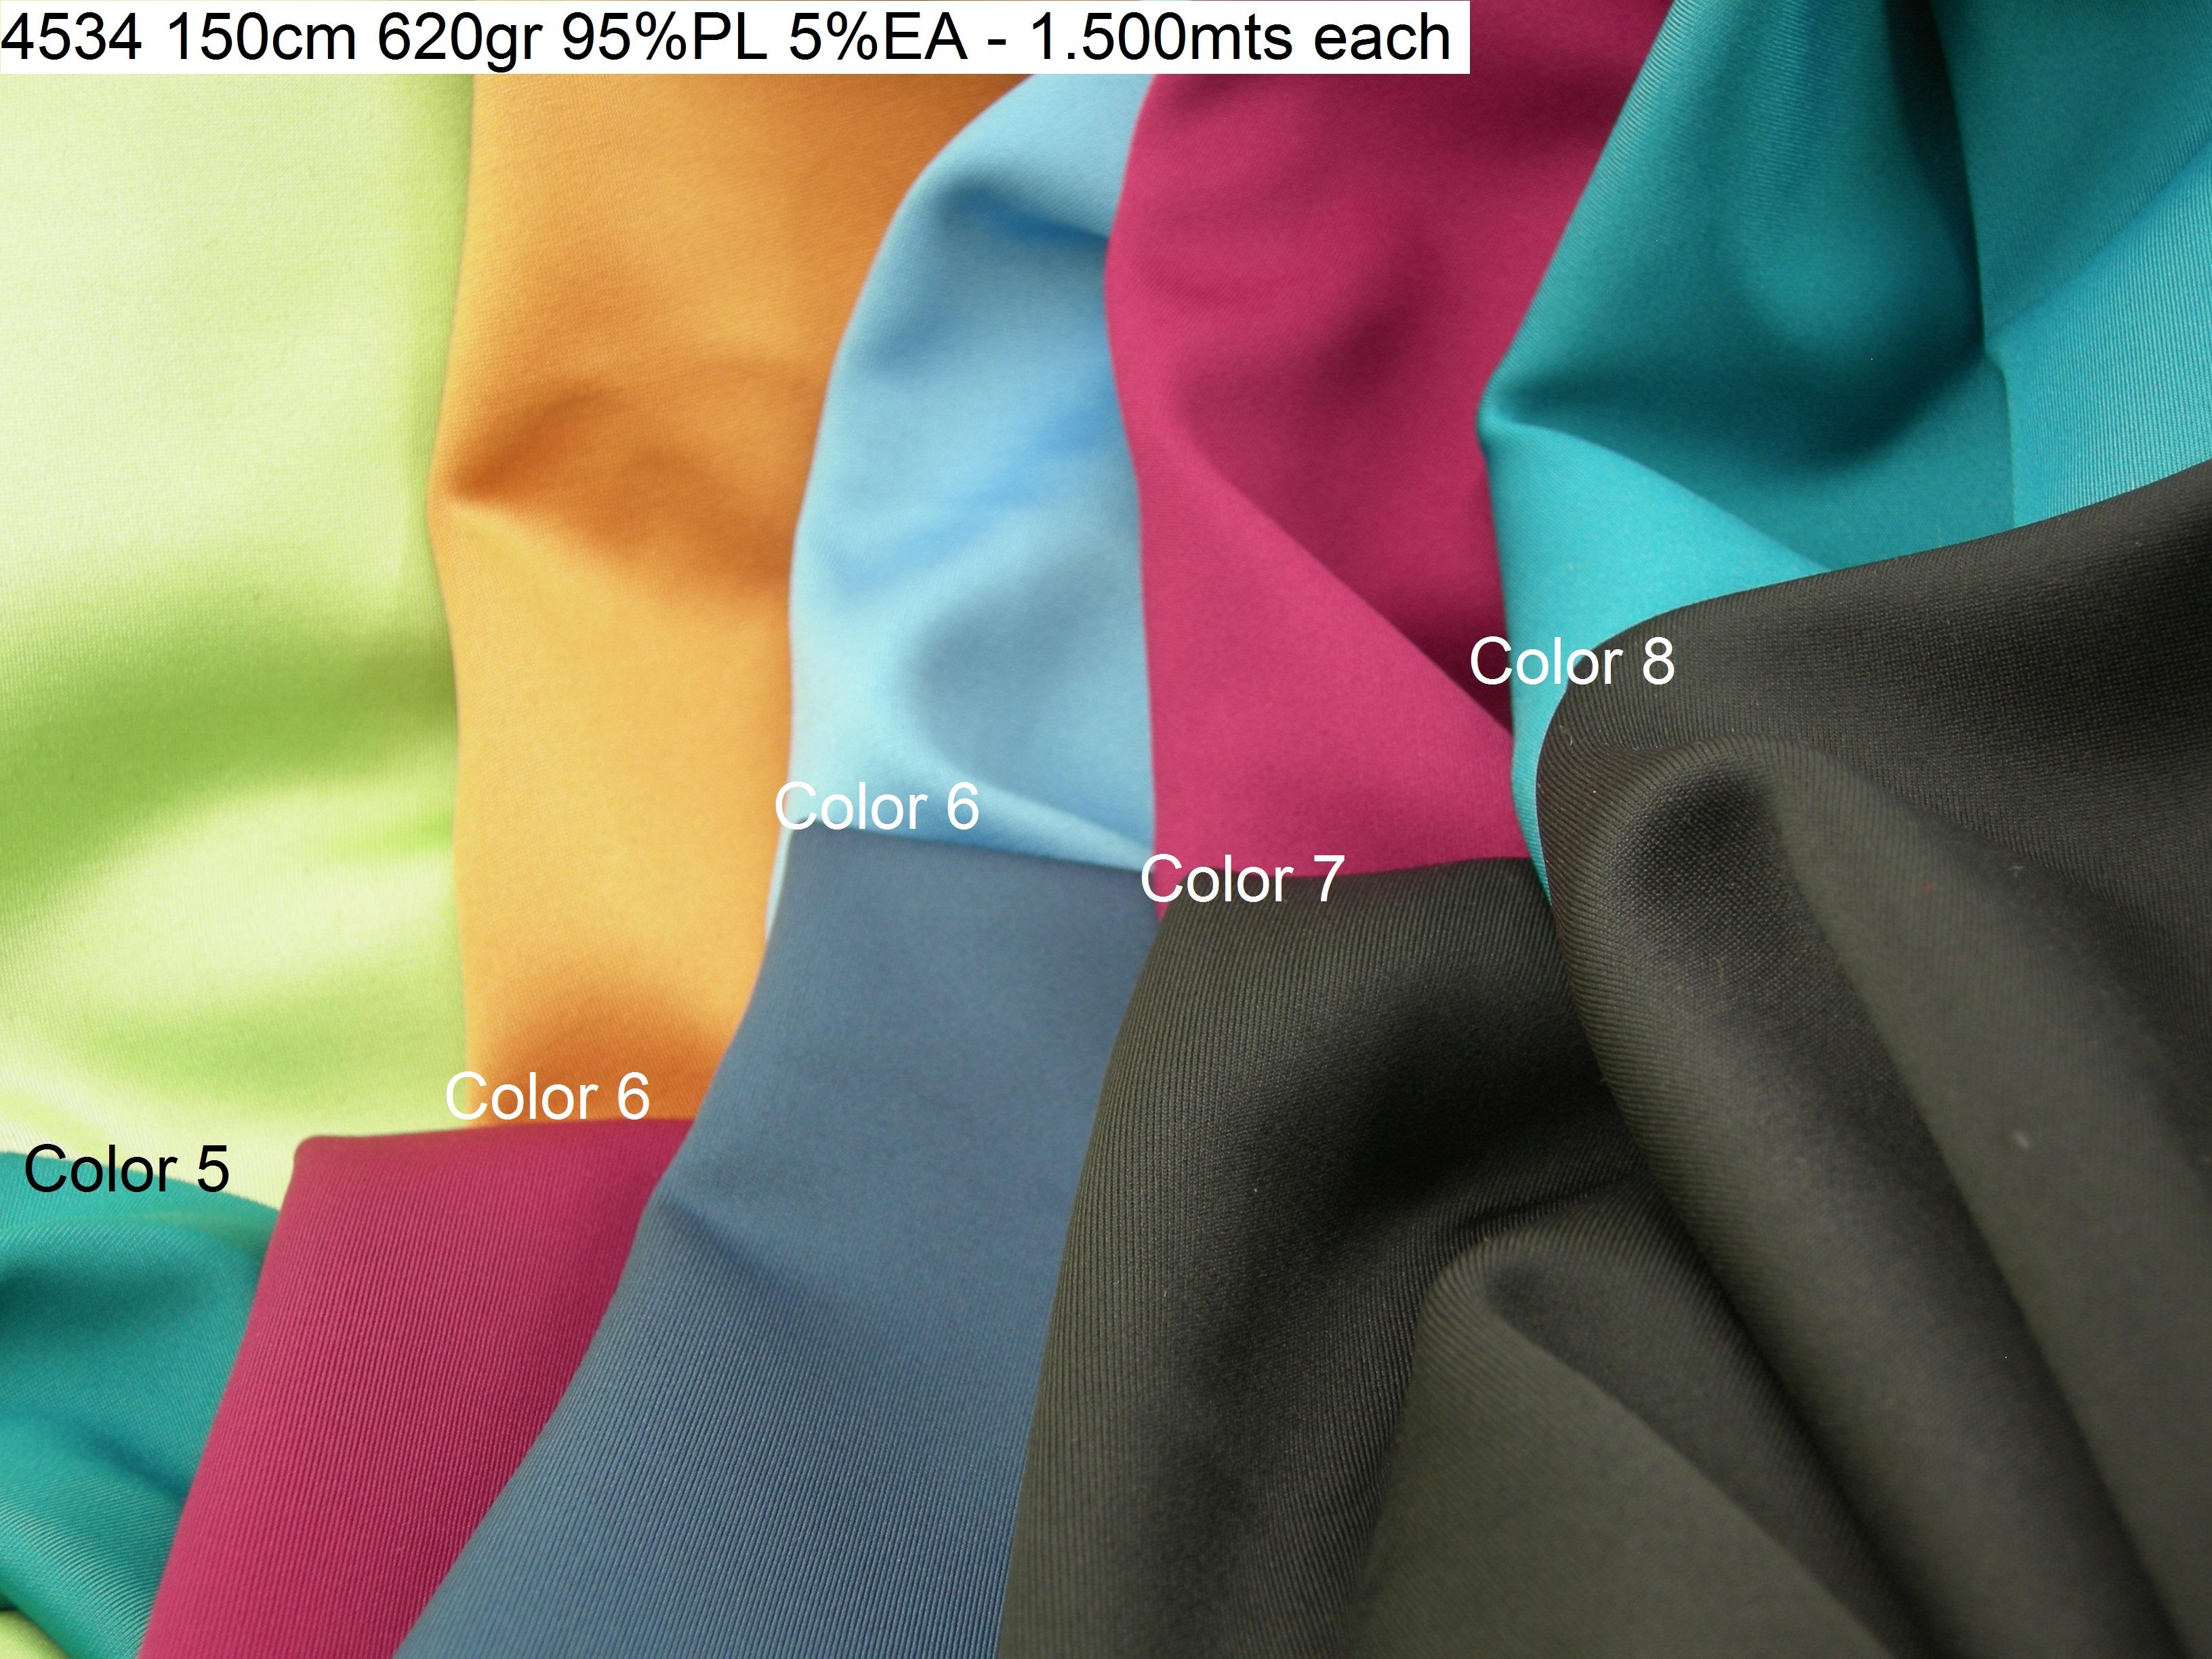 4534 scuba dobleface jacket coat fashion fabric